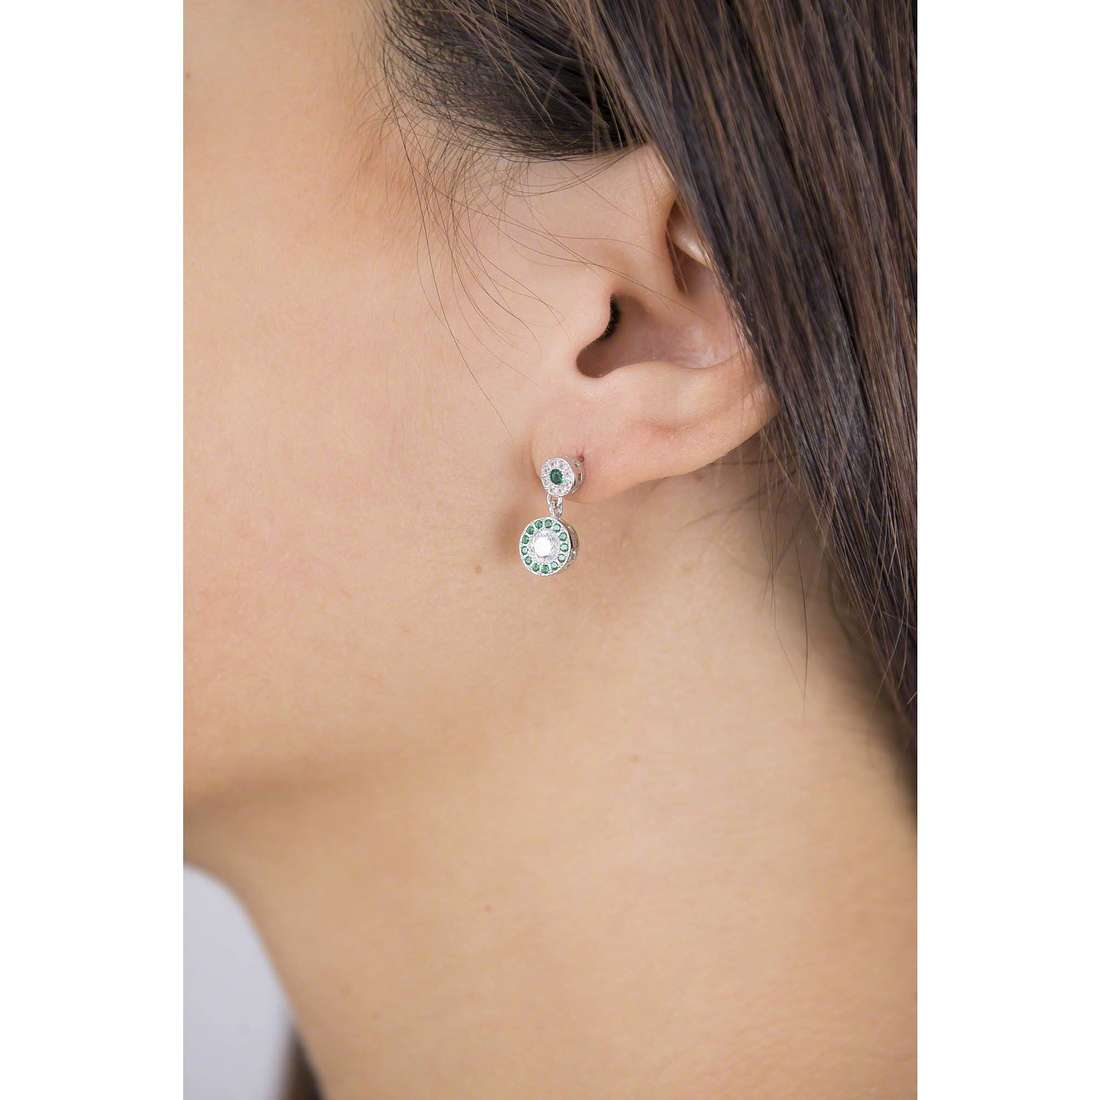 GioiaPura earrings woman GPSRSOR2303-VE indosso